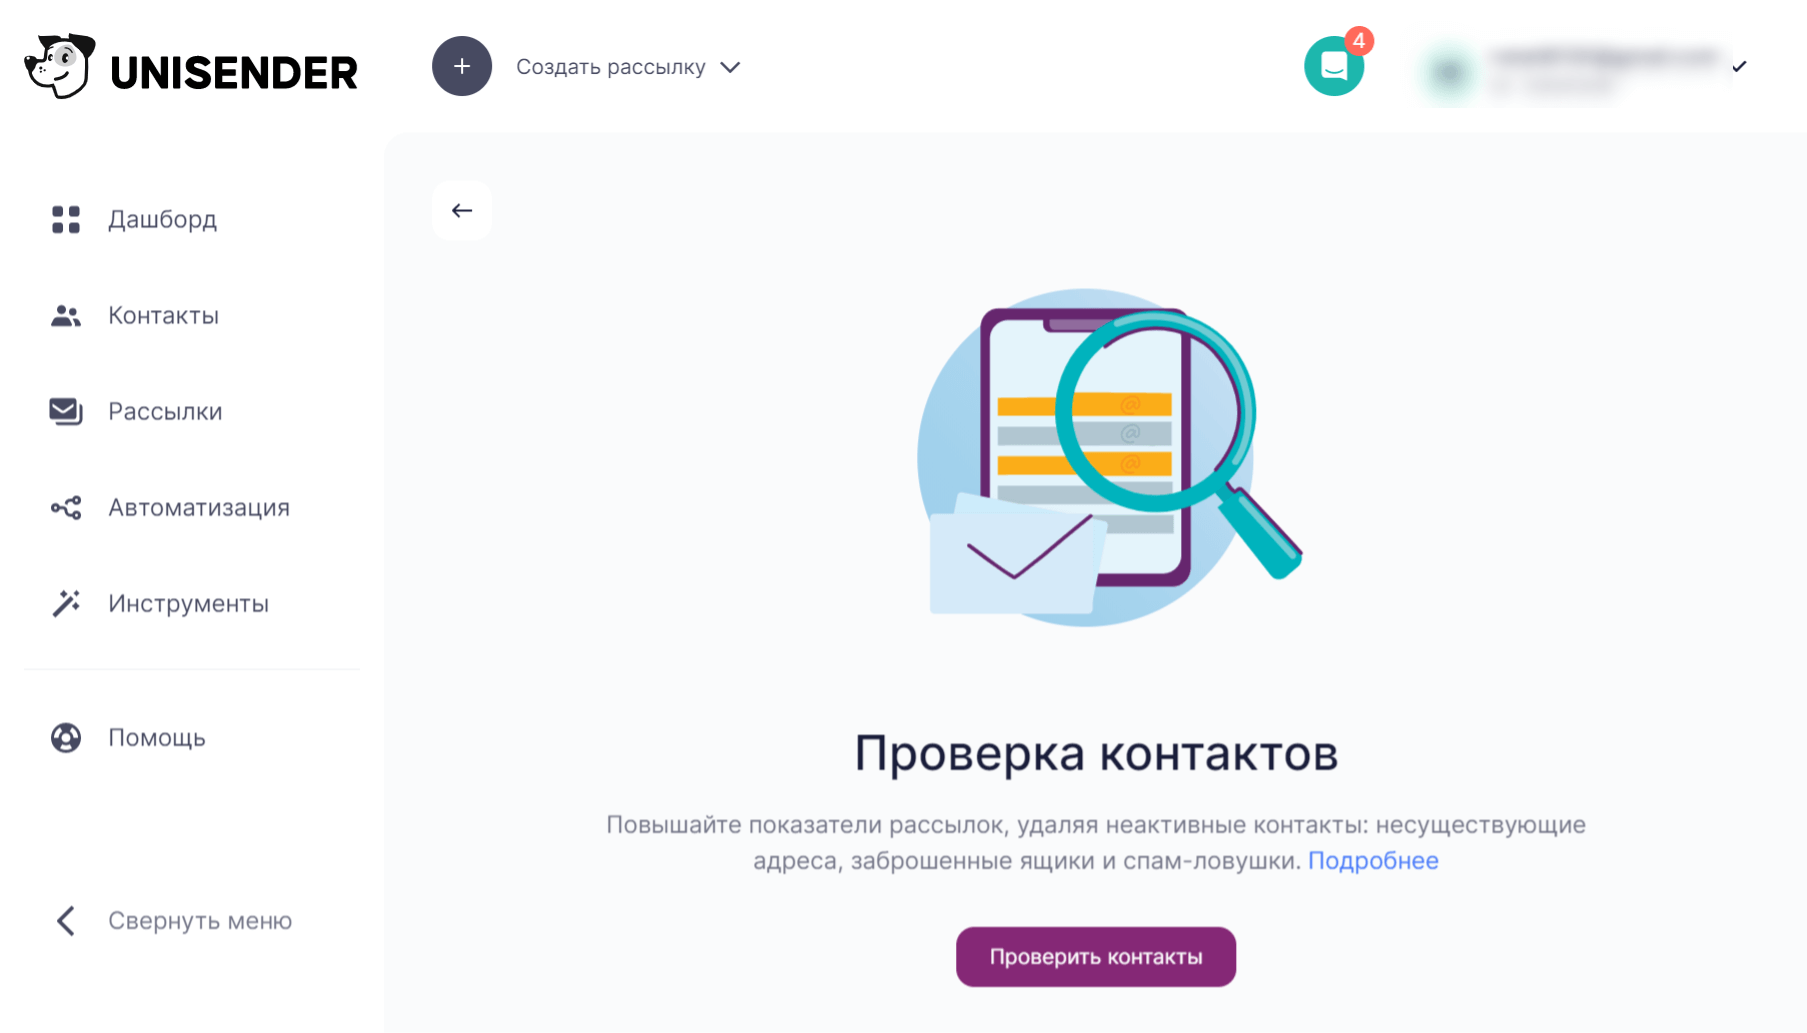 Сервис проверки контактов от Unisender